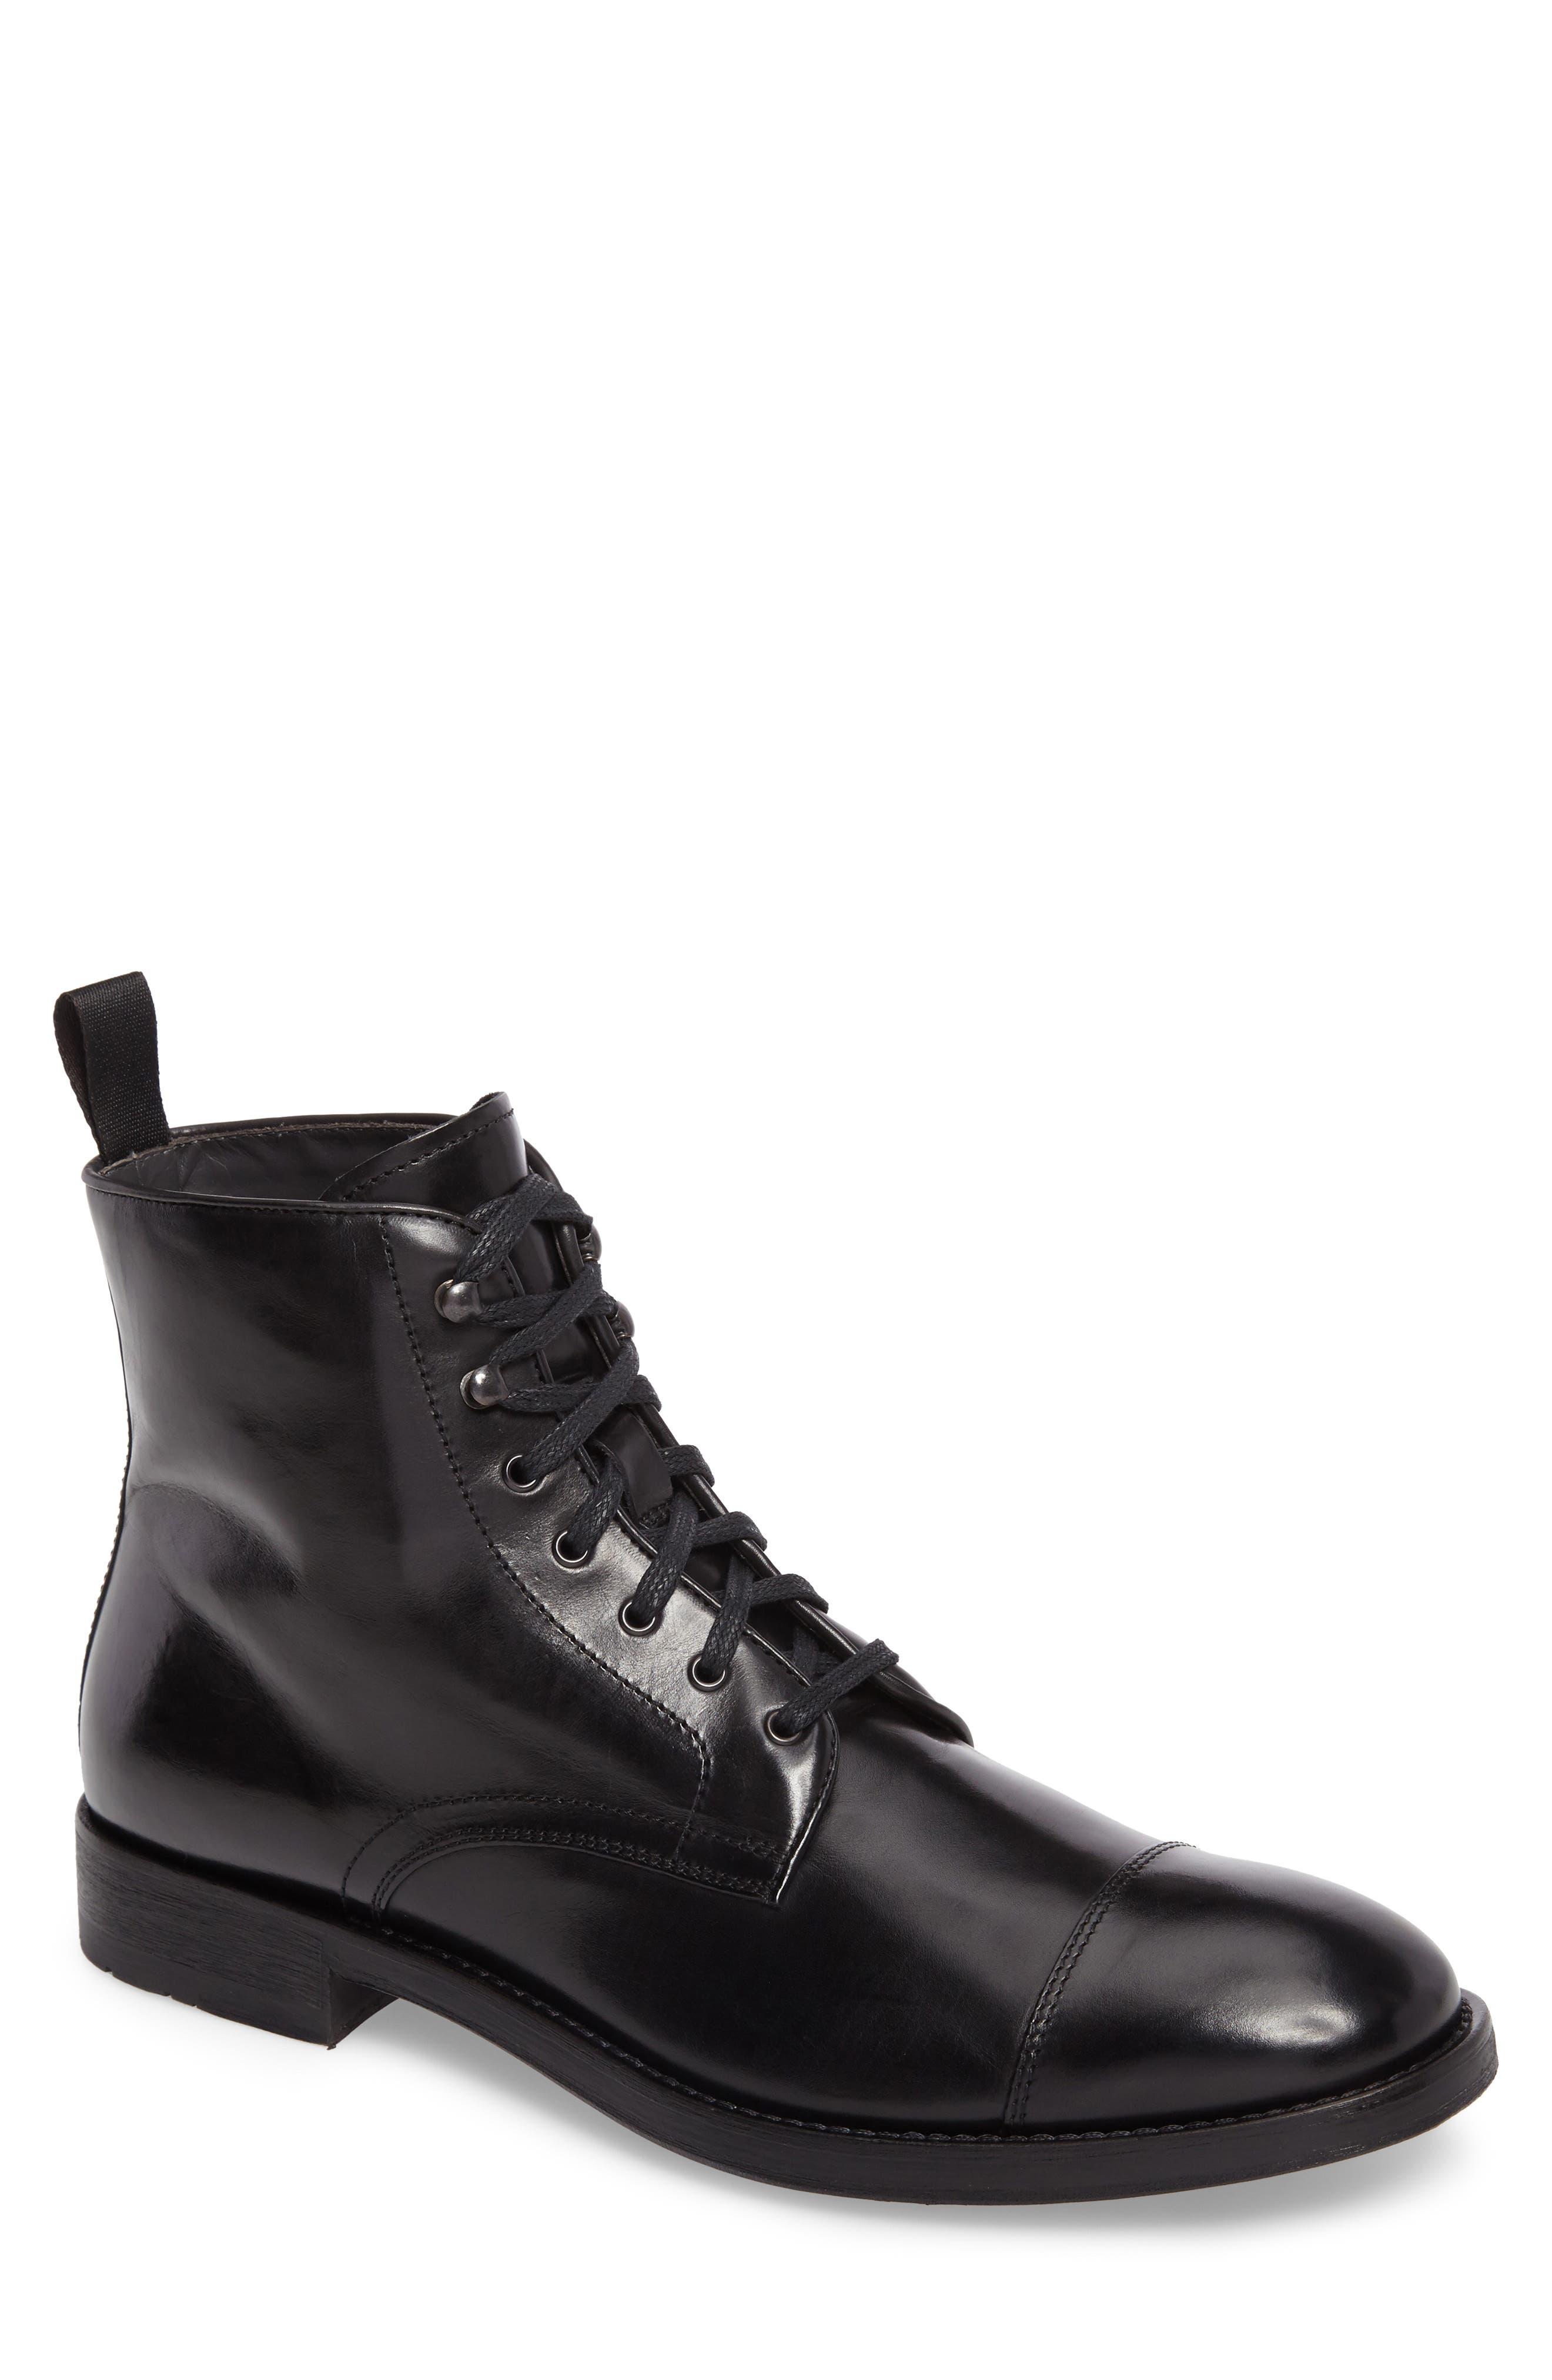 Bondfield Cap Toe Boot,                         Main,                         color,